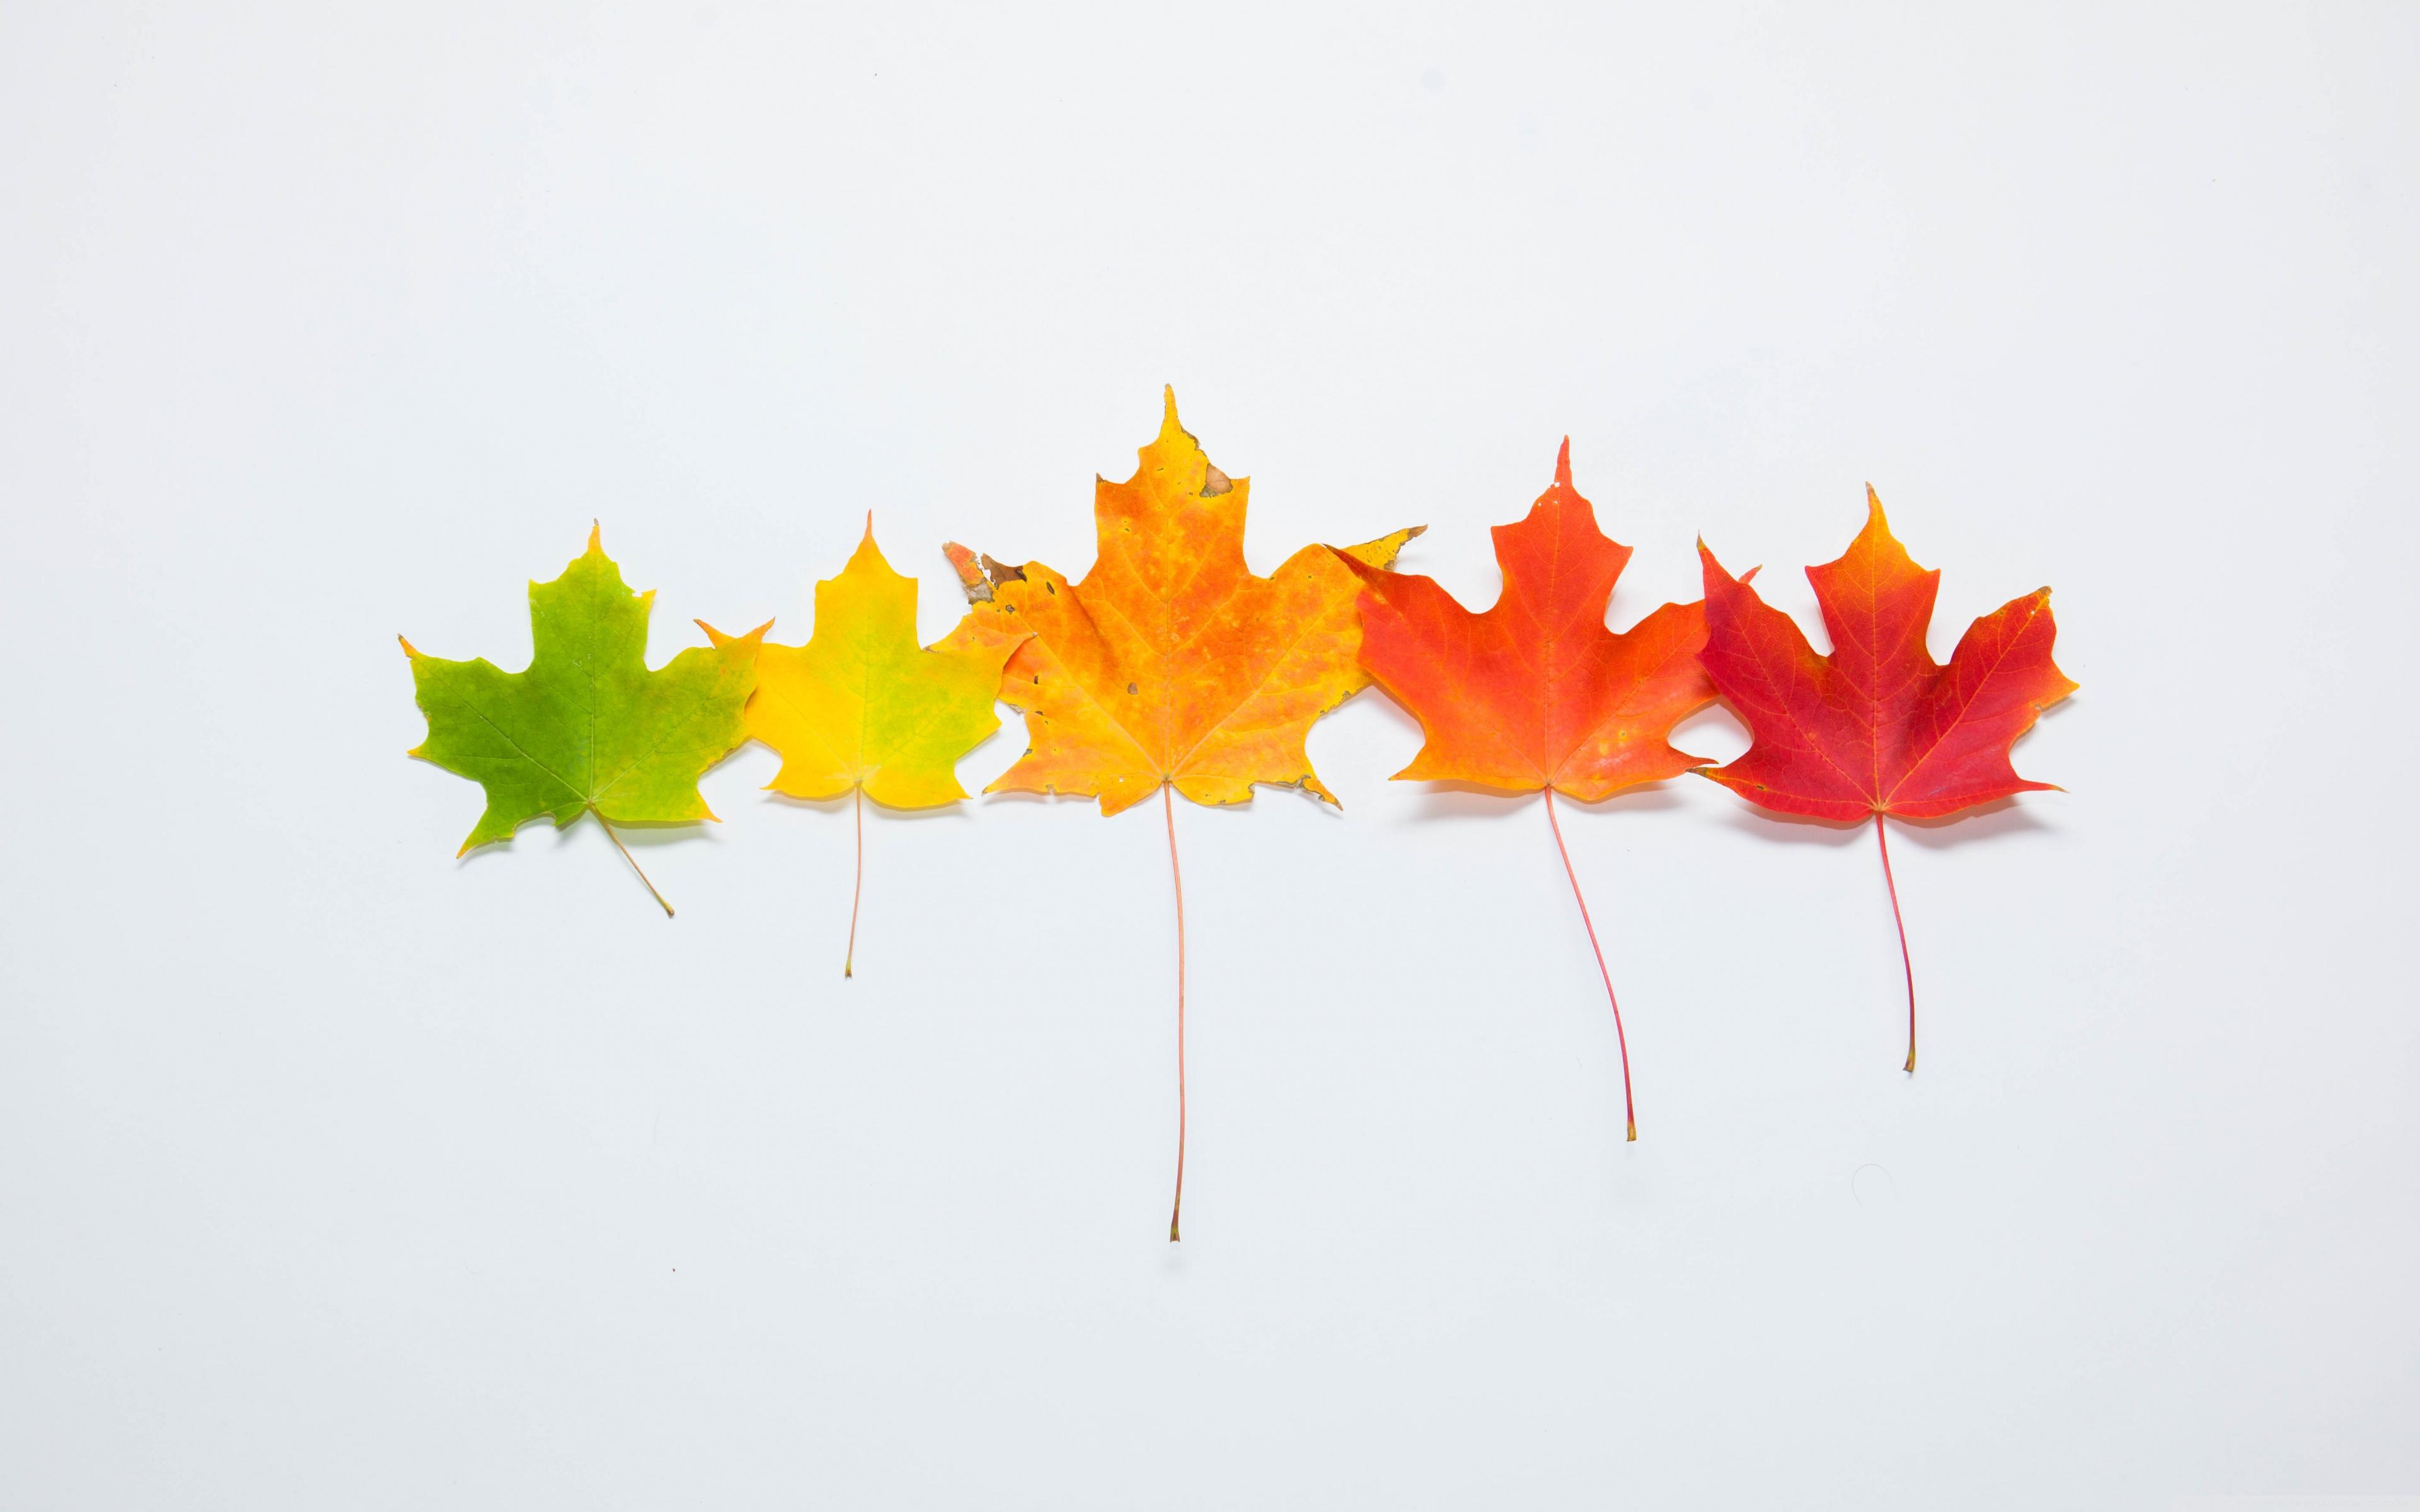 Simple Fall Desktop Backgrounds - HD Wallpaper